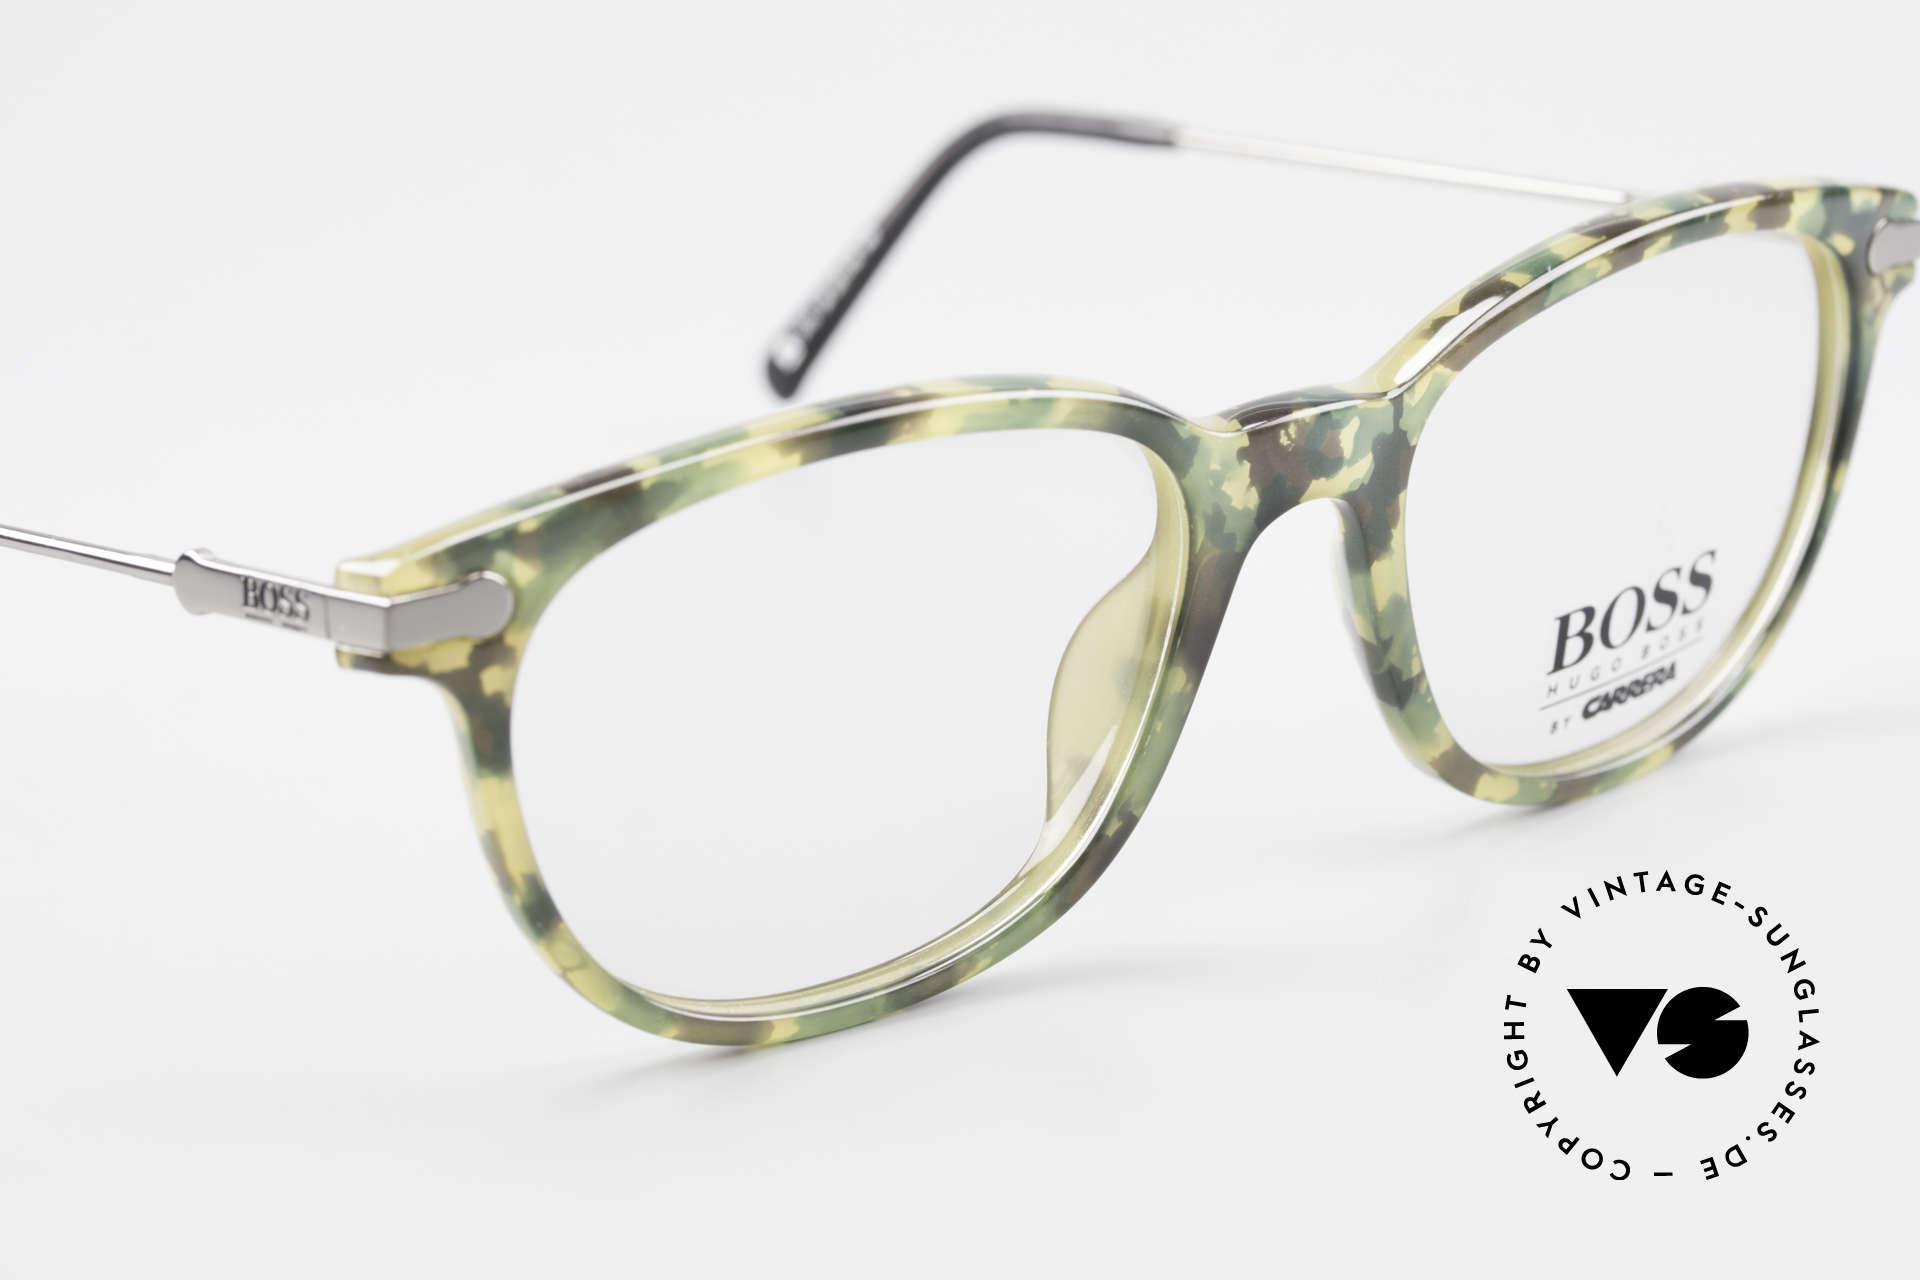 BOSS 5115 Camouflage Vintage Eyeglasses, NO RETRO eyewear; but a 25 years old ORIGINAL!, Made for Men